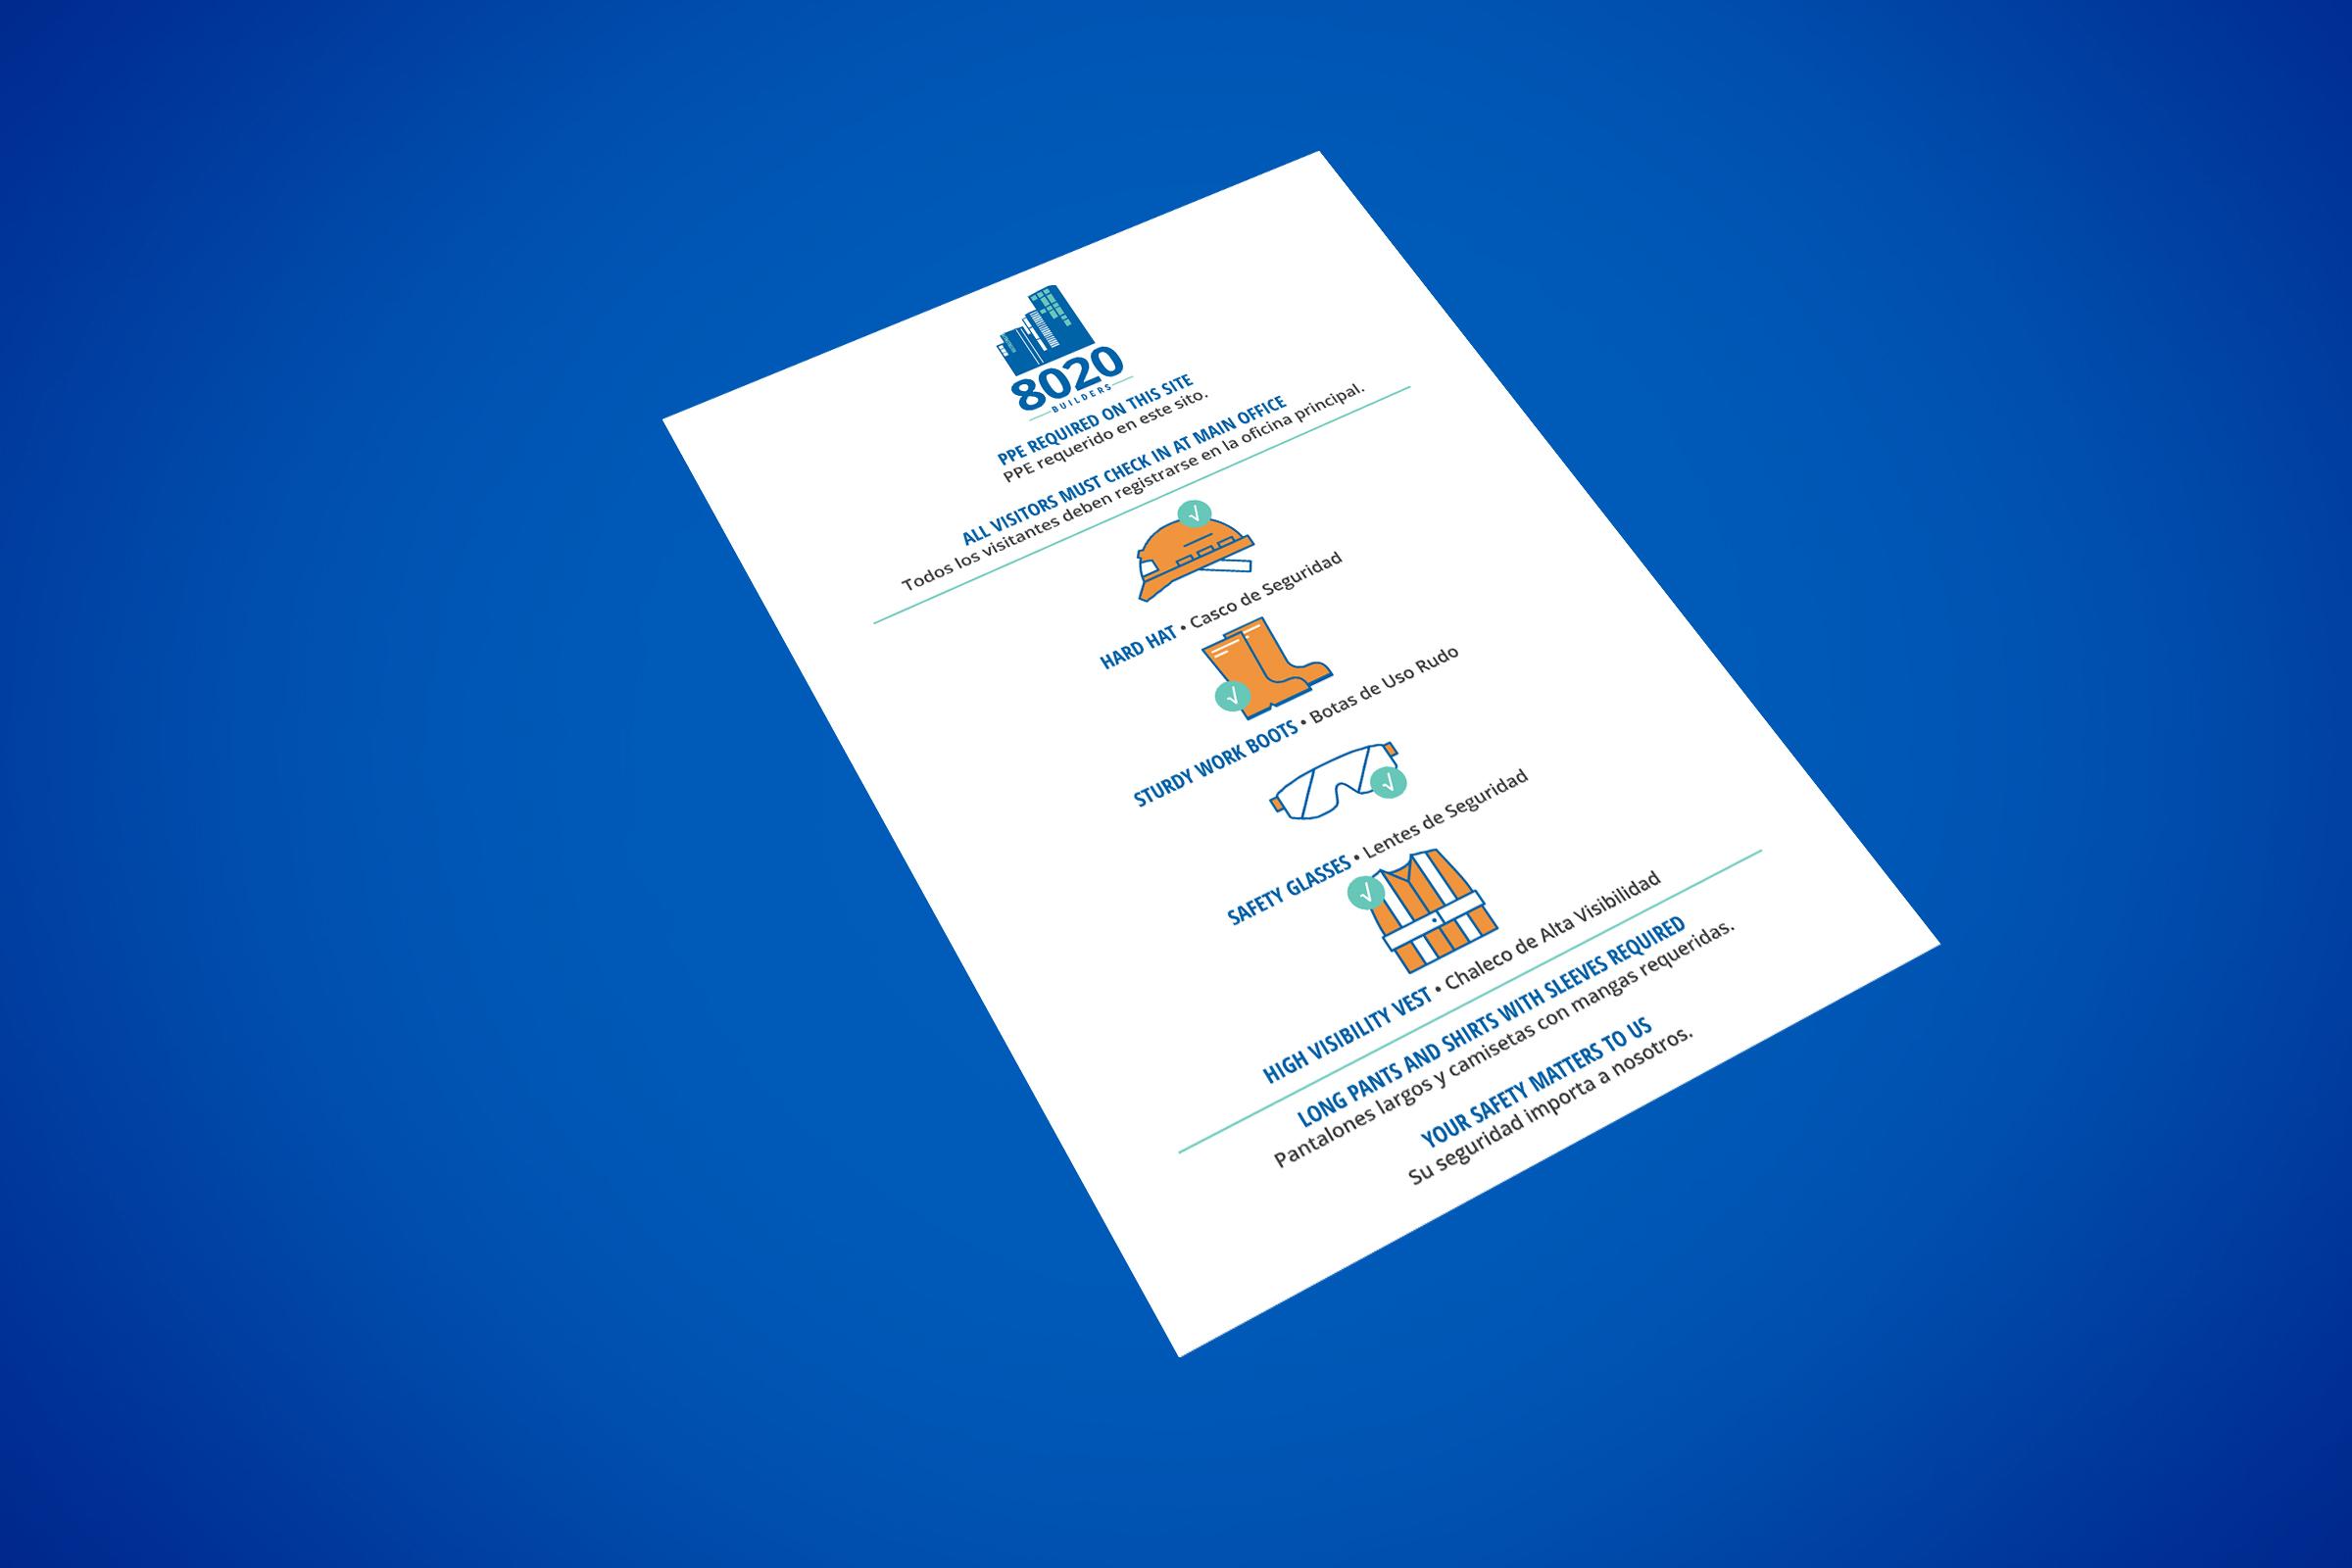 hearthfire-creative-logo-brand-identity-designer-denver-colorado-8020-builders-5.jpg